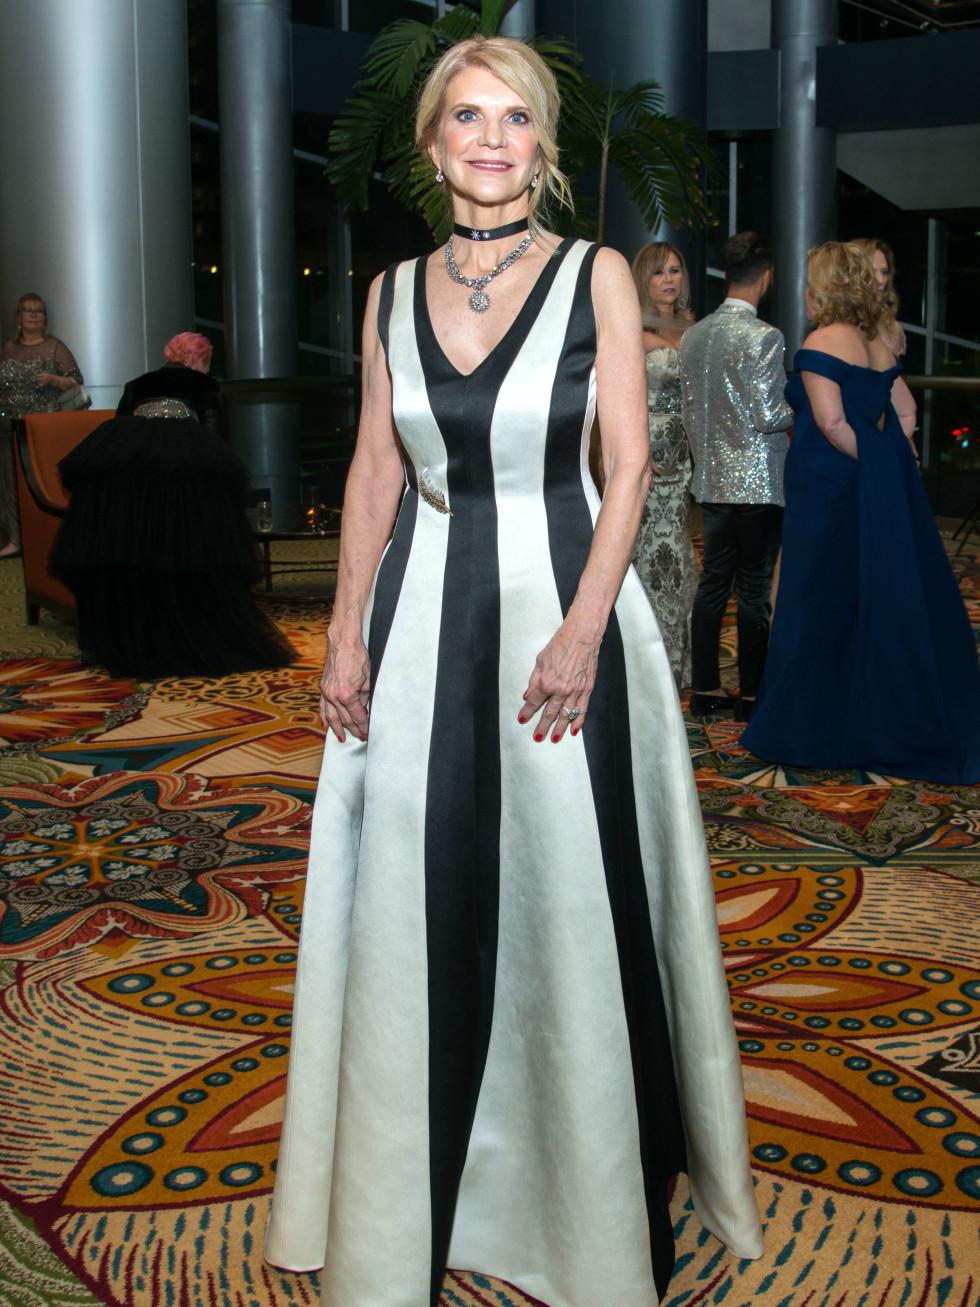 Houston, Women of Distinction fashionable gowns, Feb 2017, Kim Tutcher